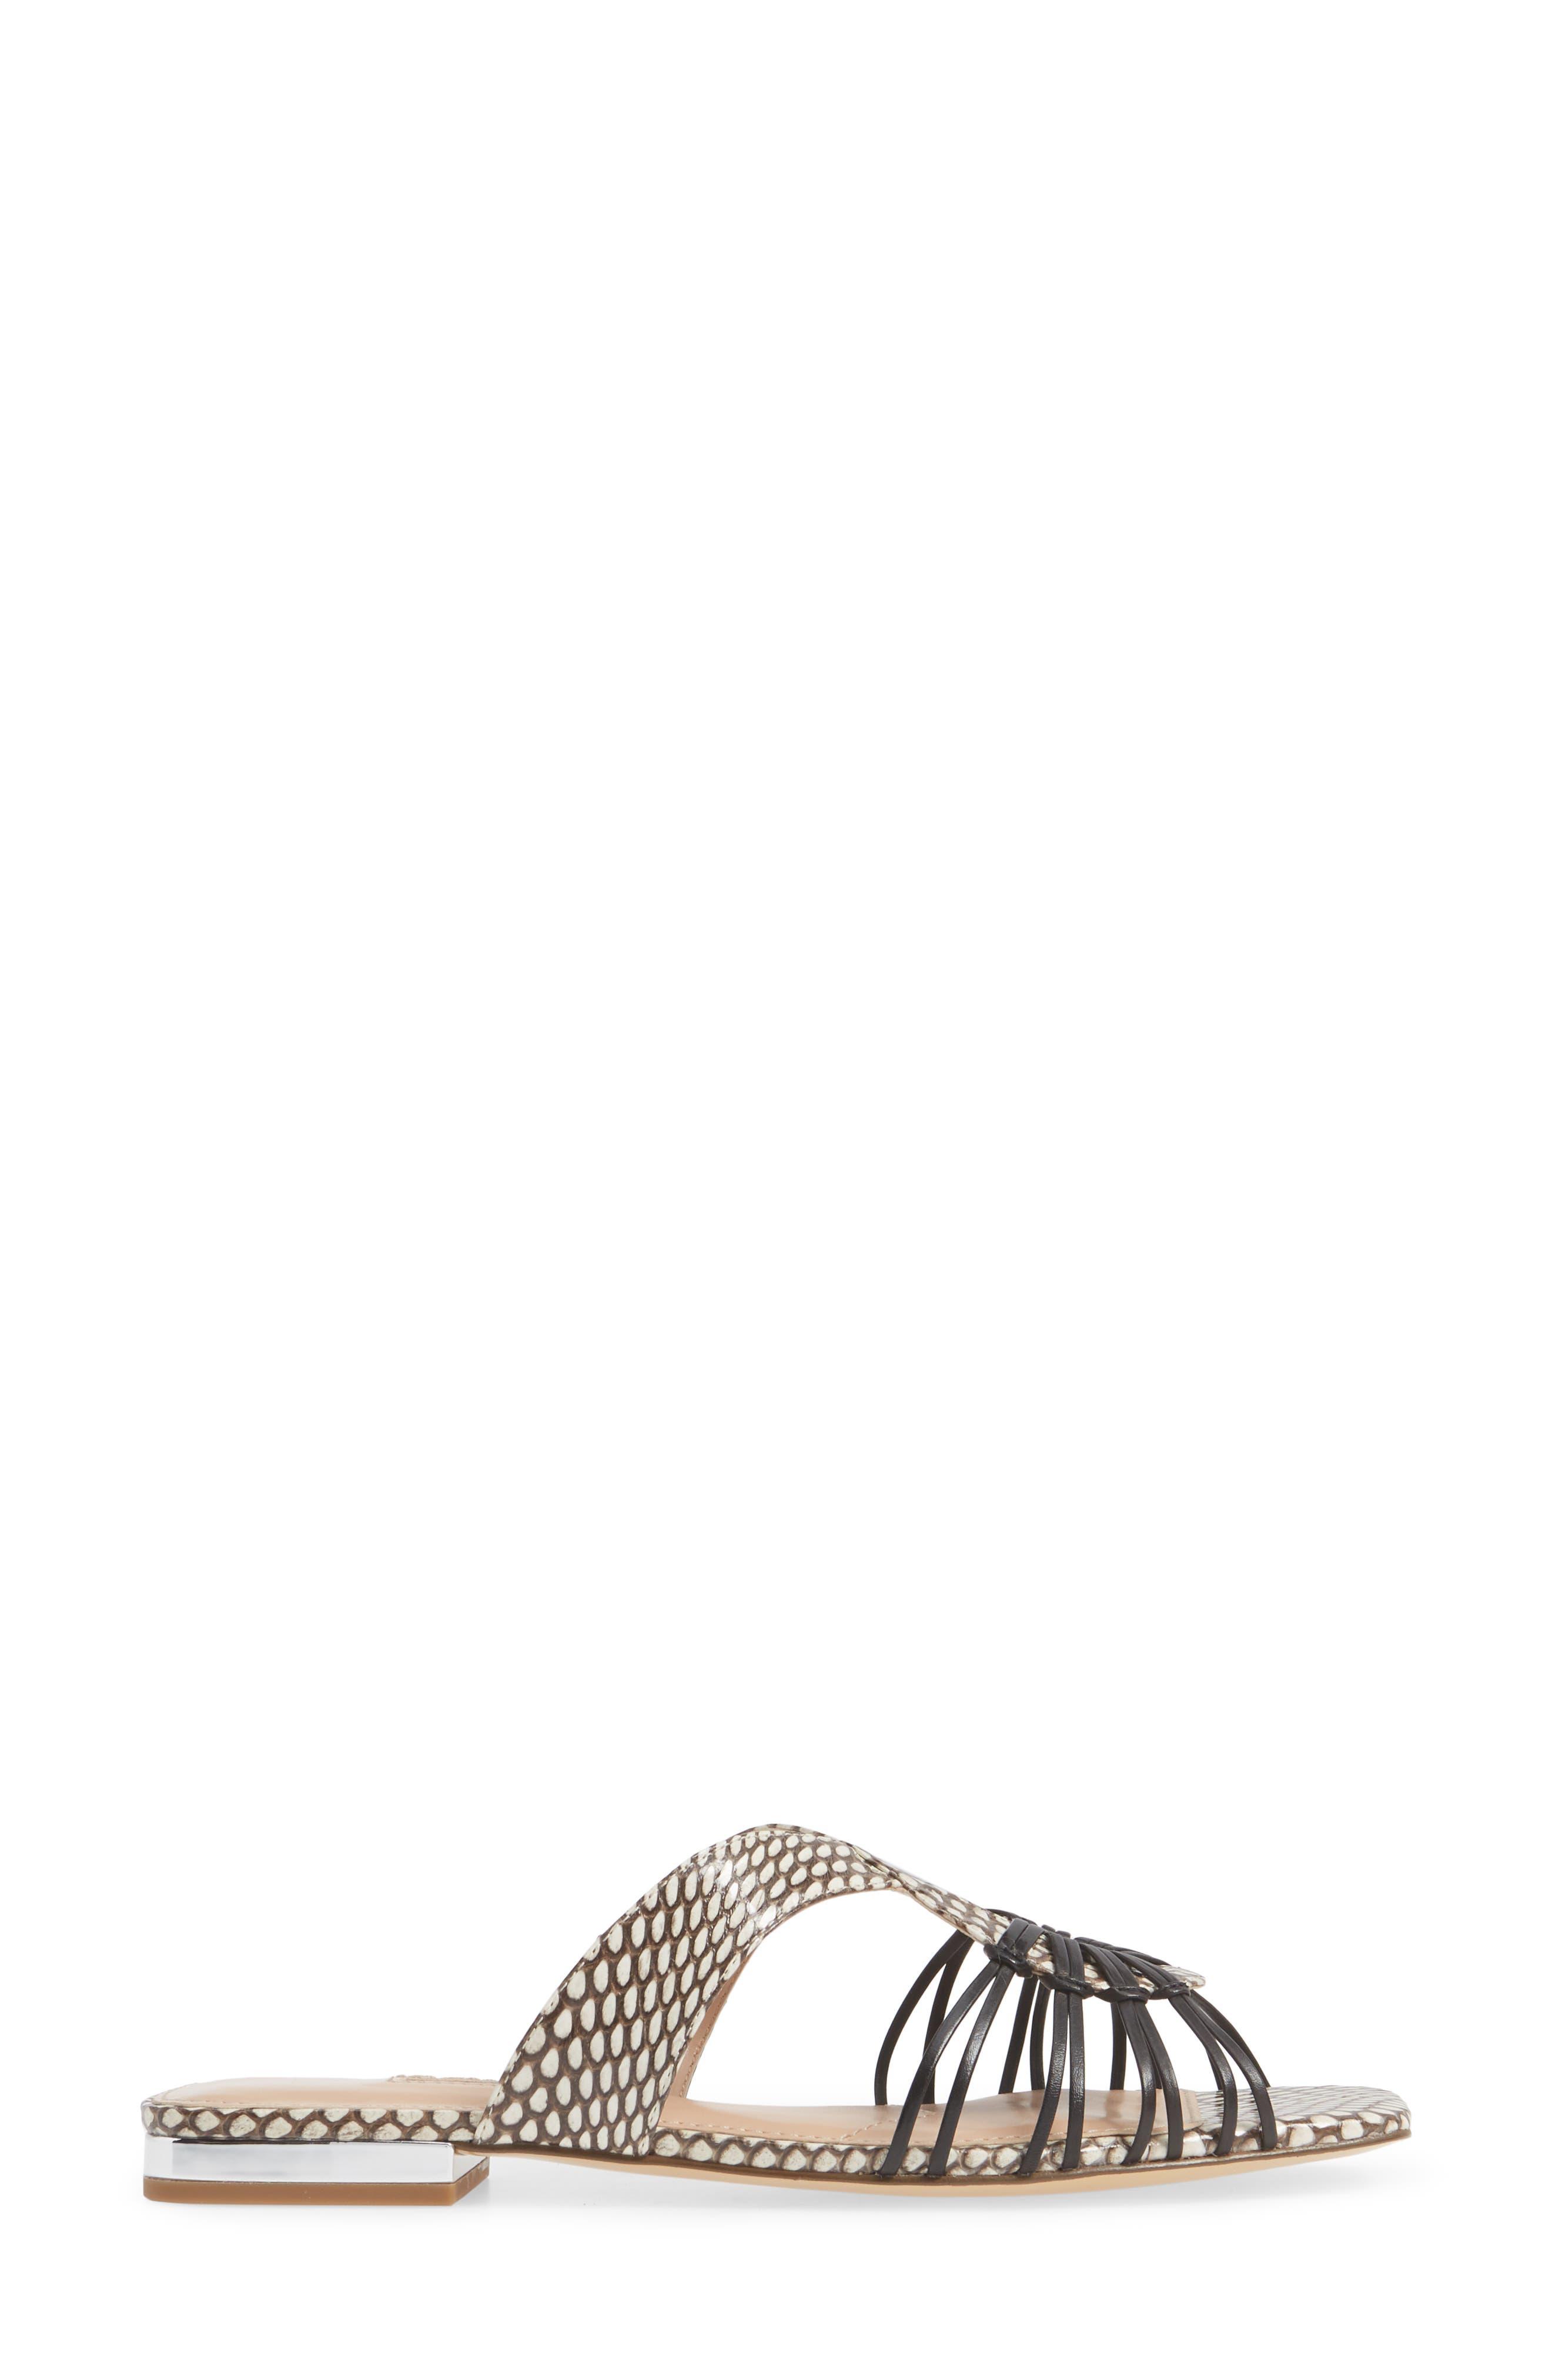 Silvy Sandal,                             Alternate thumbnail 3, color,                             BLACK/WHITE SNAKE LEATHER